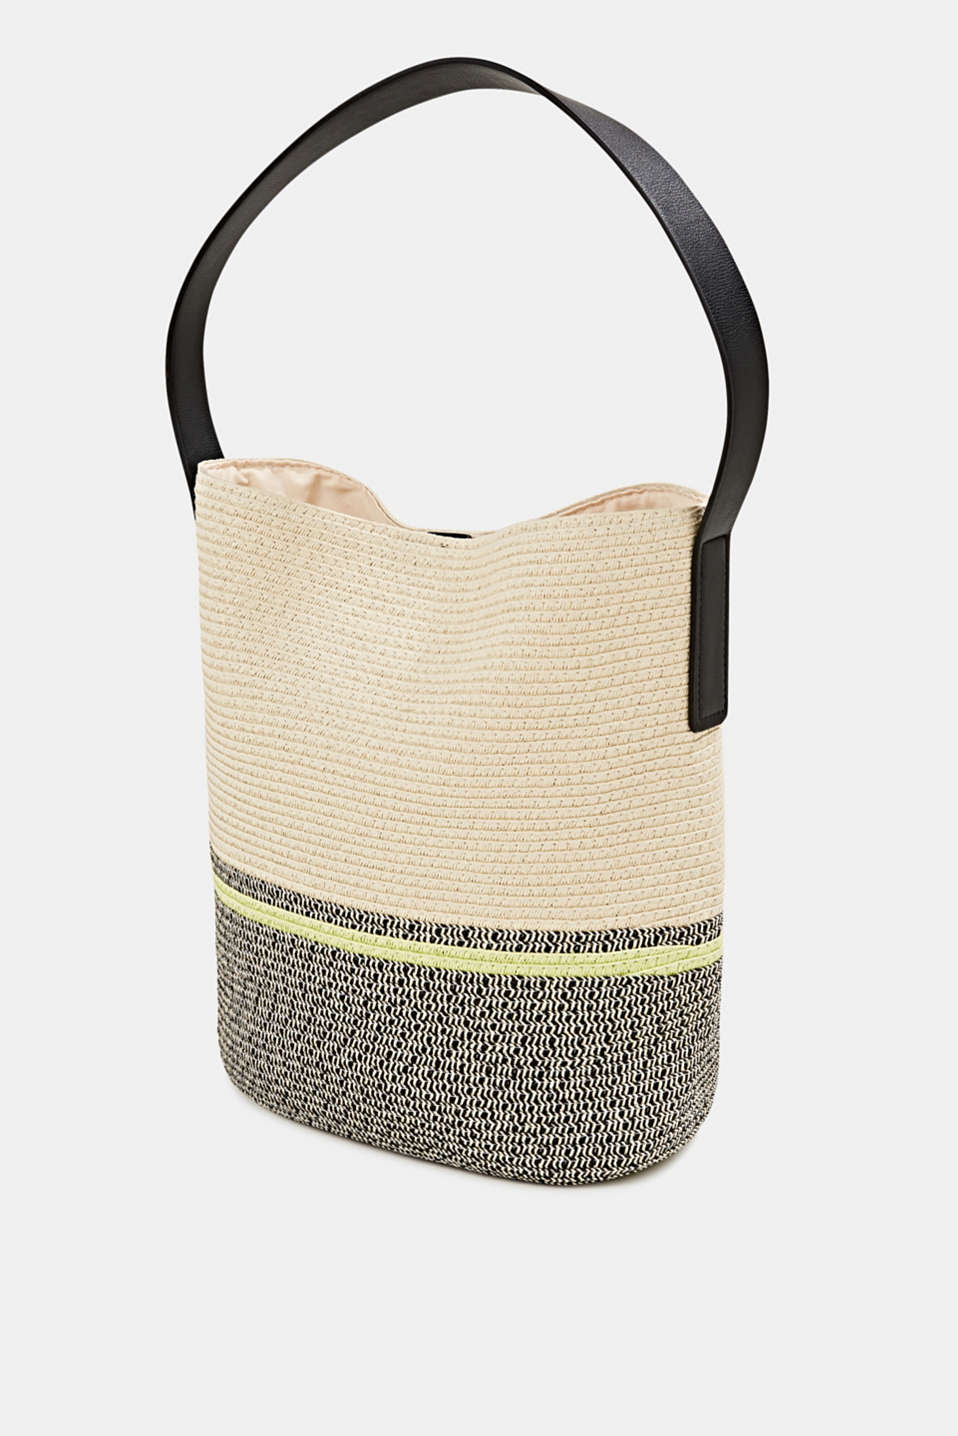 Bast shopper with contrast stripes, CREAM BEIGE, detail image number 2